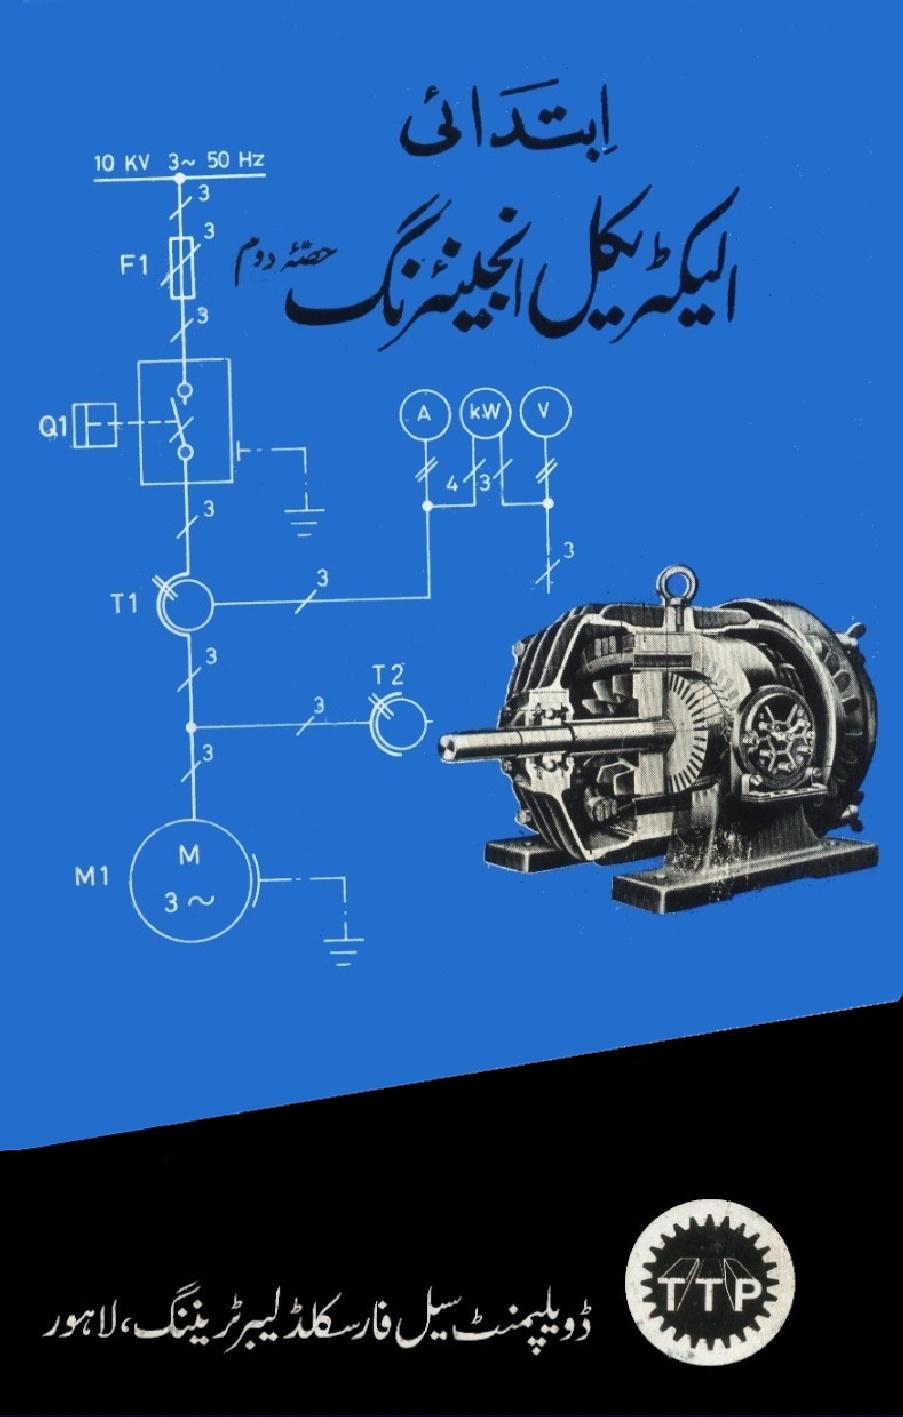 electrical wiring book in urdu pdf download wire data schema u2022 rh lemise co Urdu Books Online Urdu Books Online